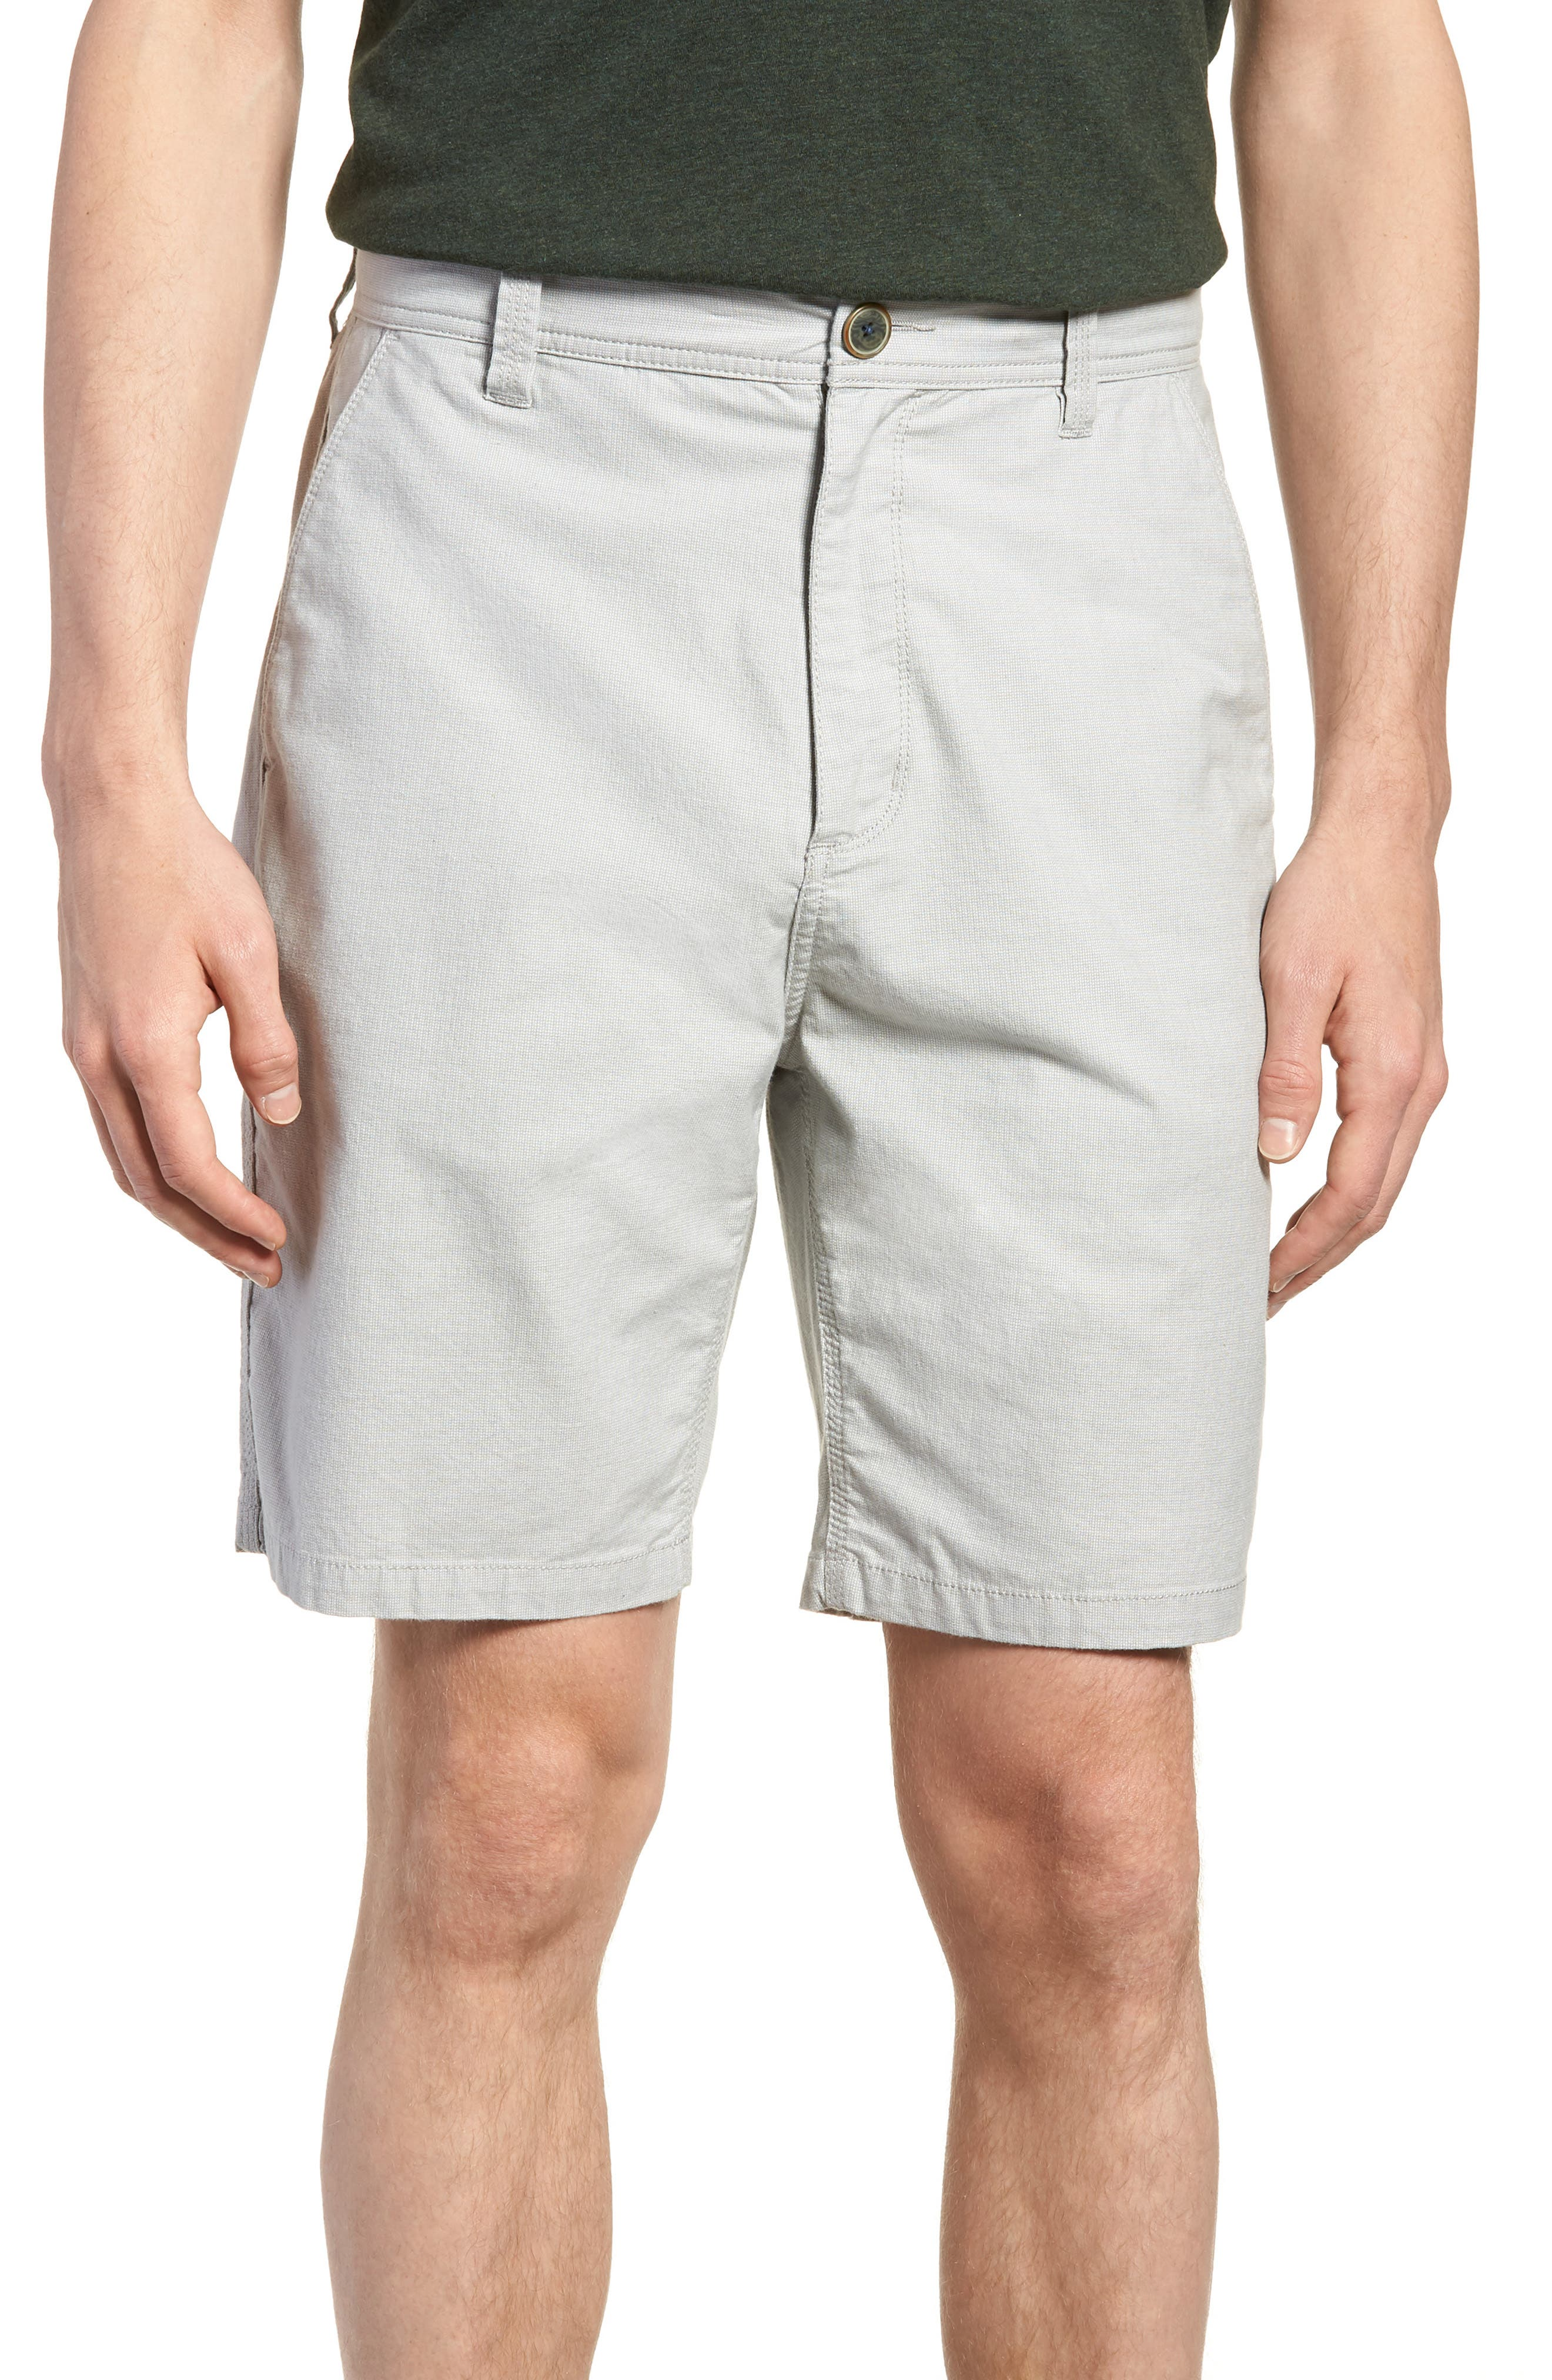 Millwater Shorts,                             Main thumbnail 1, color,                             Sand